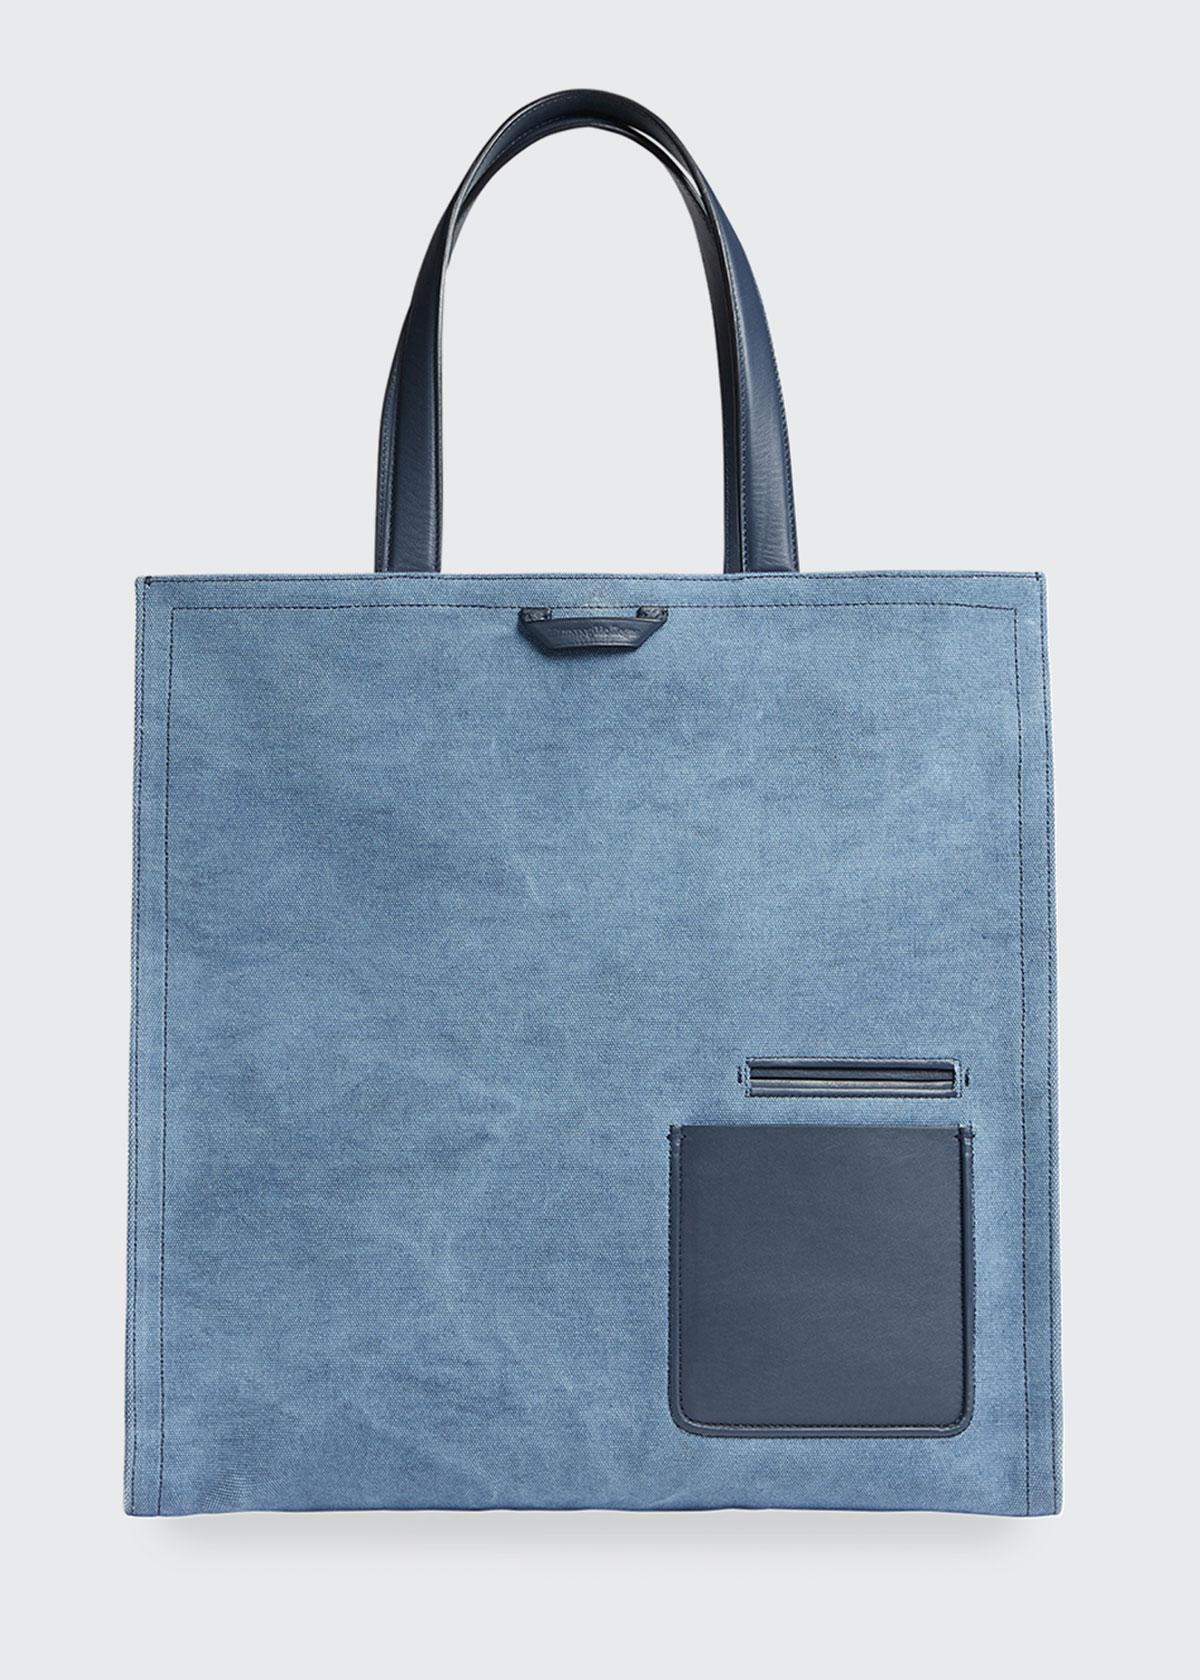 Ermenegildo Zegna Men's Blazer Canvas Tote Bag In Blue